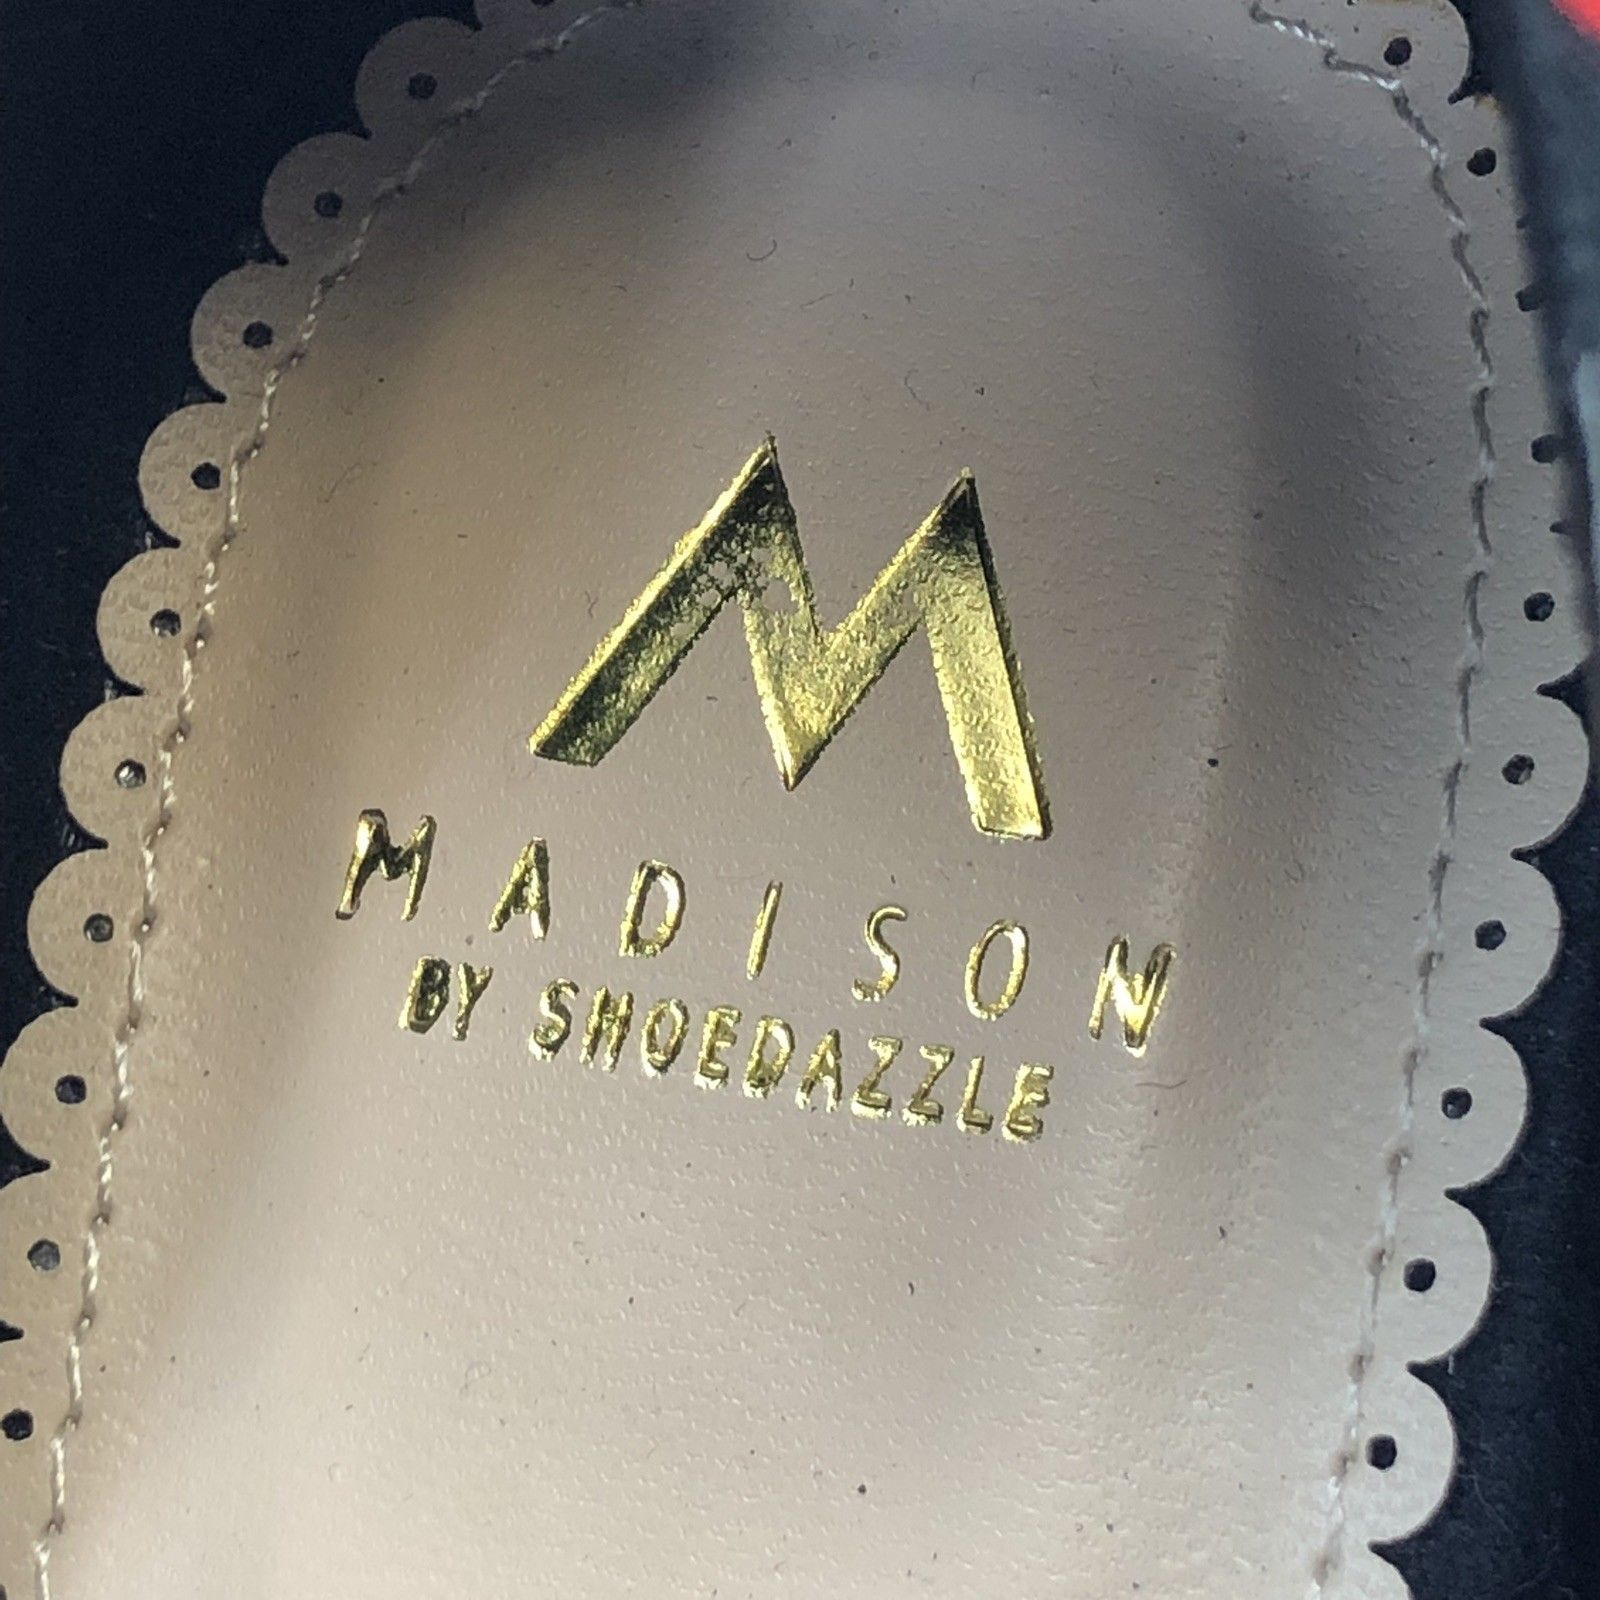 0e30a627c3c5 Madison by Shoe Dazzle Valerie Heels Woman s Size 8 Stiletto Shoes Polka  Dots